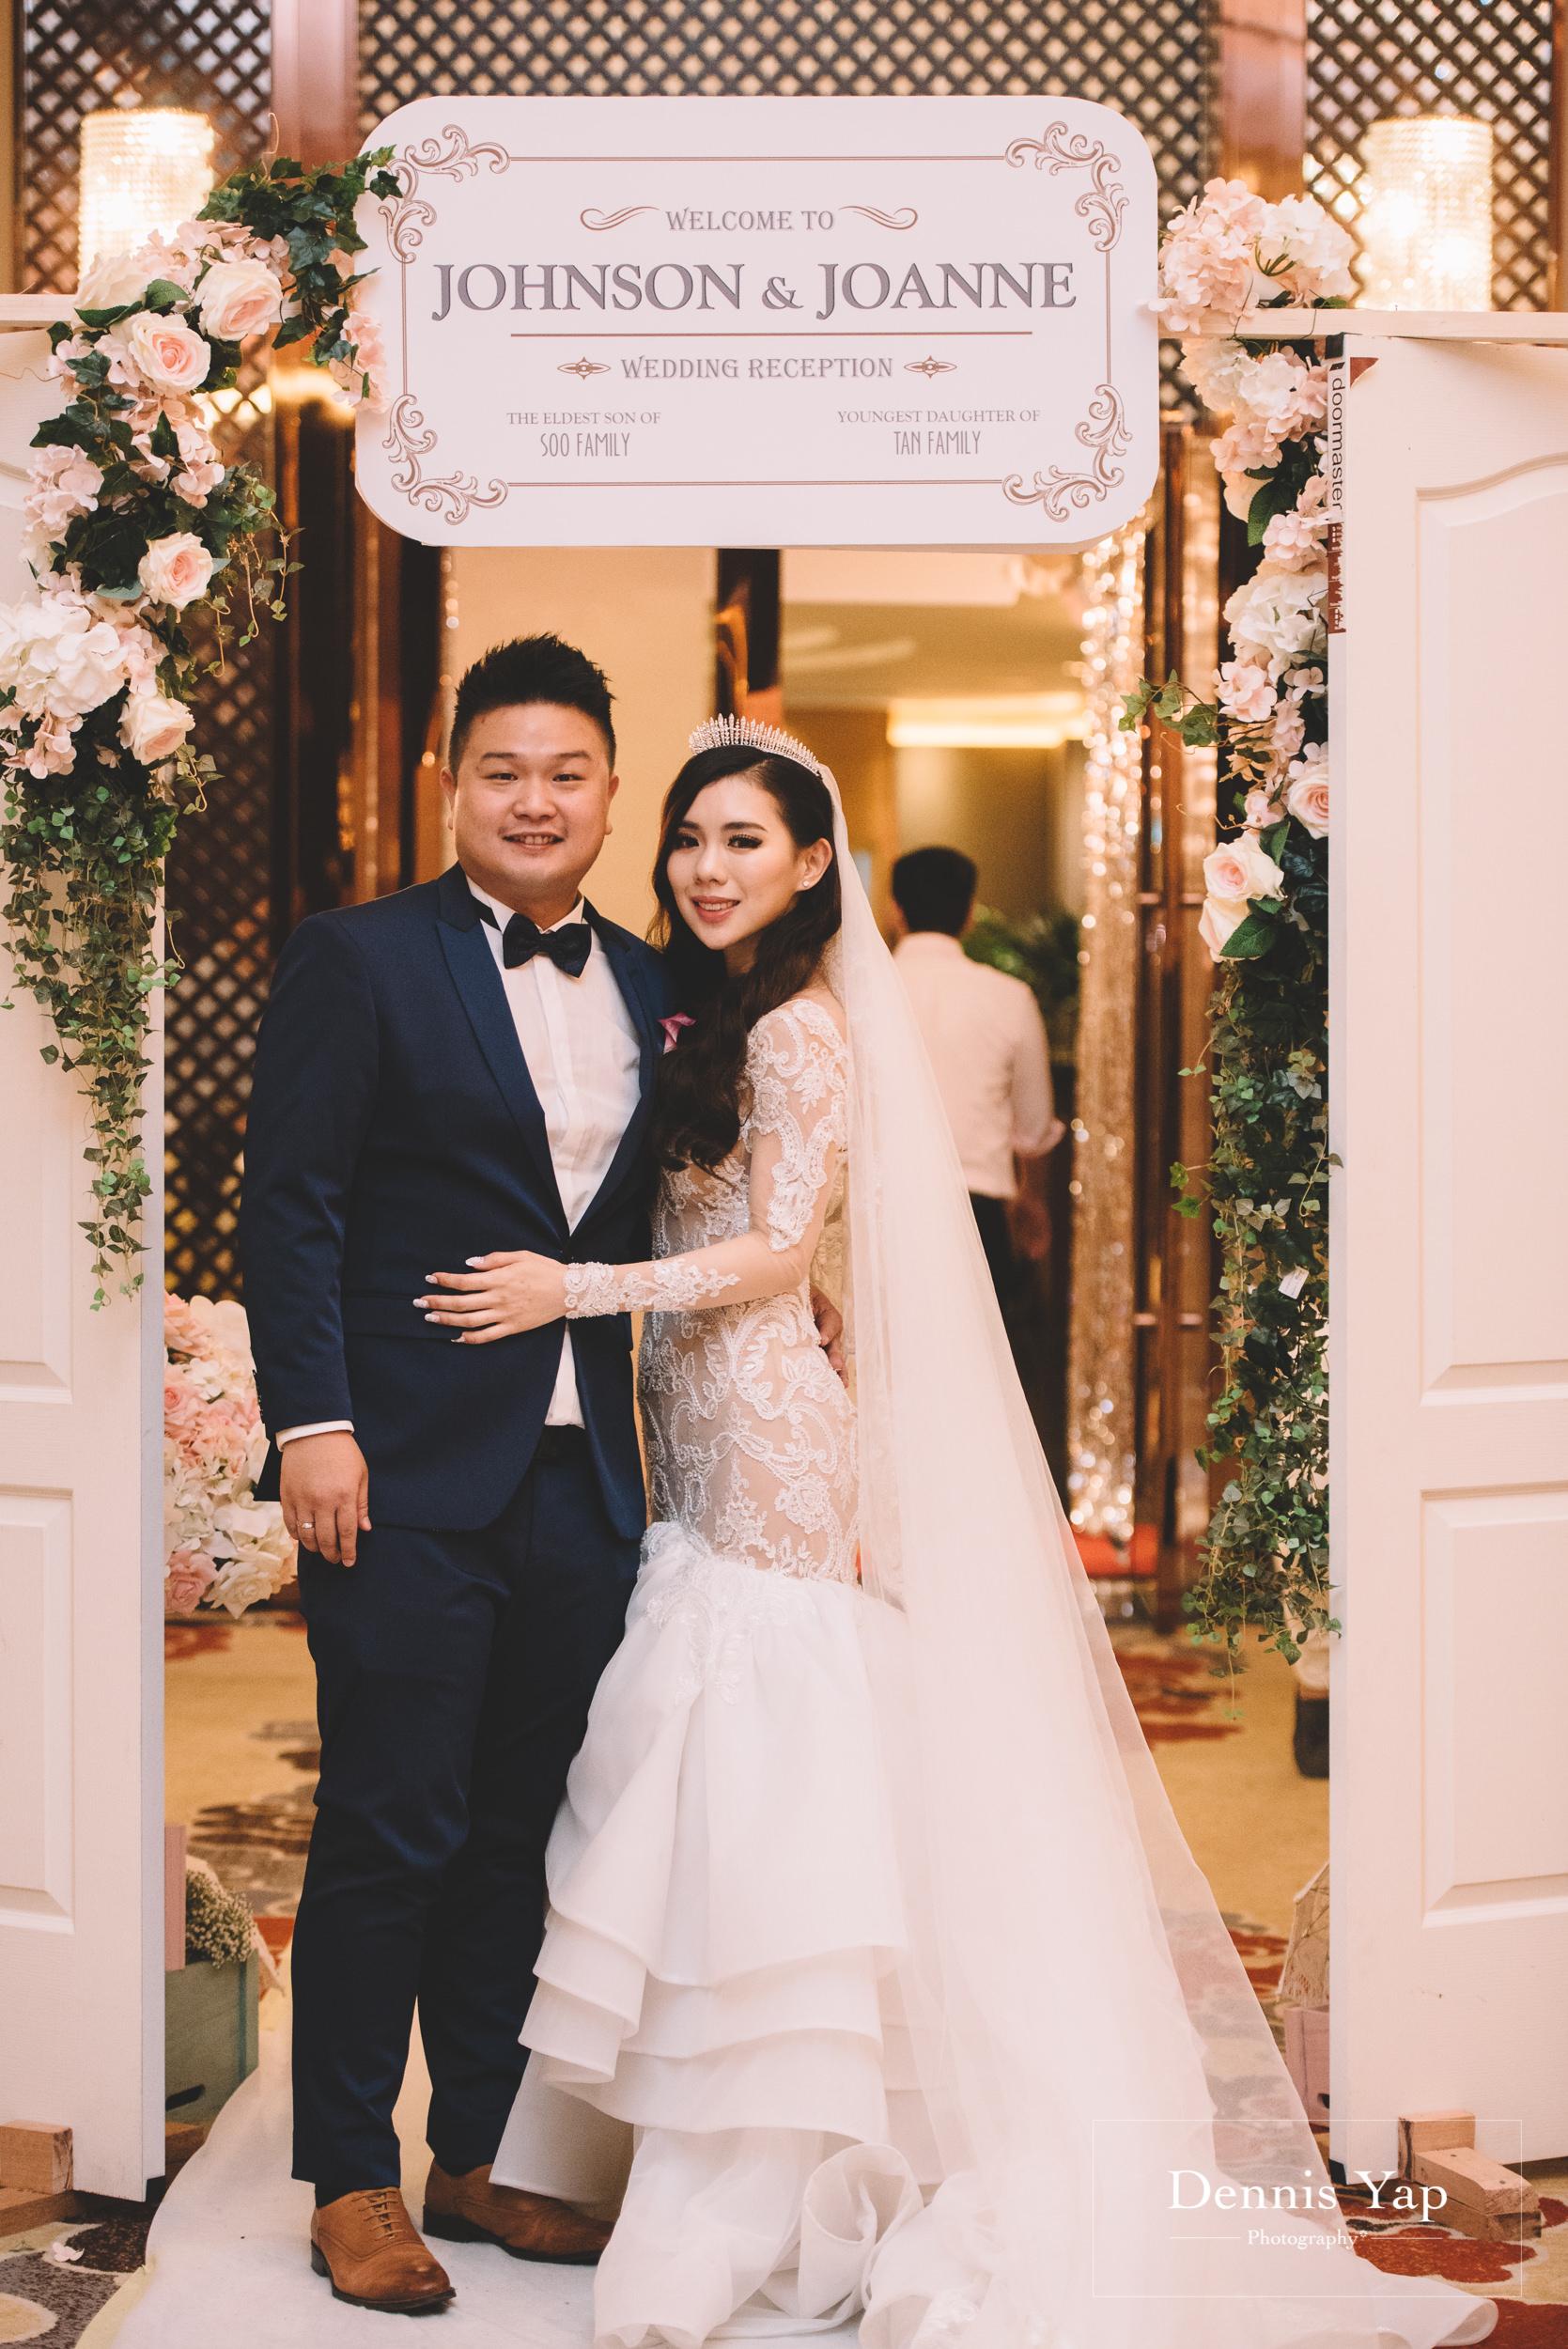 johnson joanne wedding dinner klang centro malaysia wedding photographer dennis yap-13.jpg